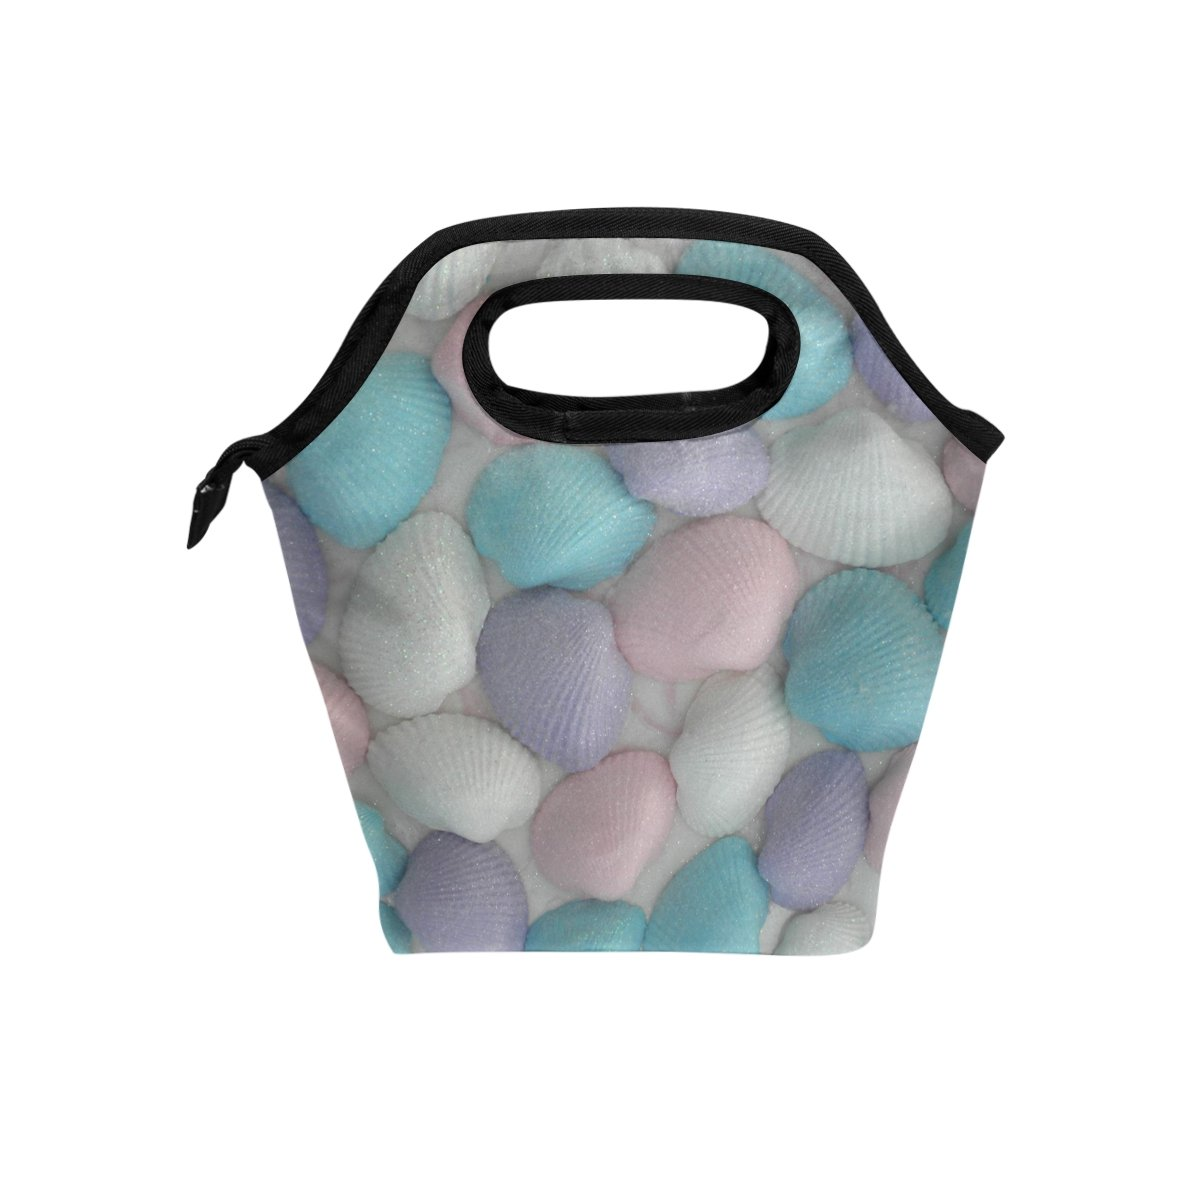 JSTEL Seashells - Bolsa de almuerzo, bolsa de almuerzo, contenedor de alimentos, gourmet, bento, bento, bolsa de refrigeración, bolsa caliente para viajes, picnic, escuela, oficina bolsa de refrigeración